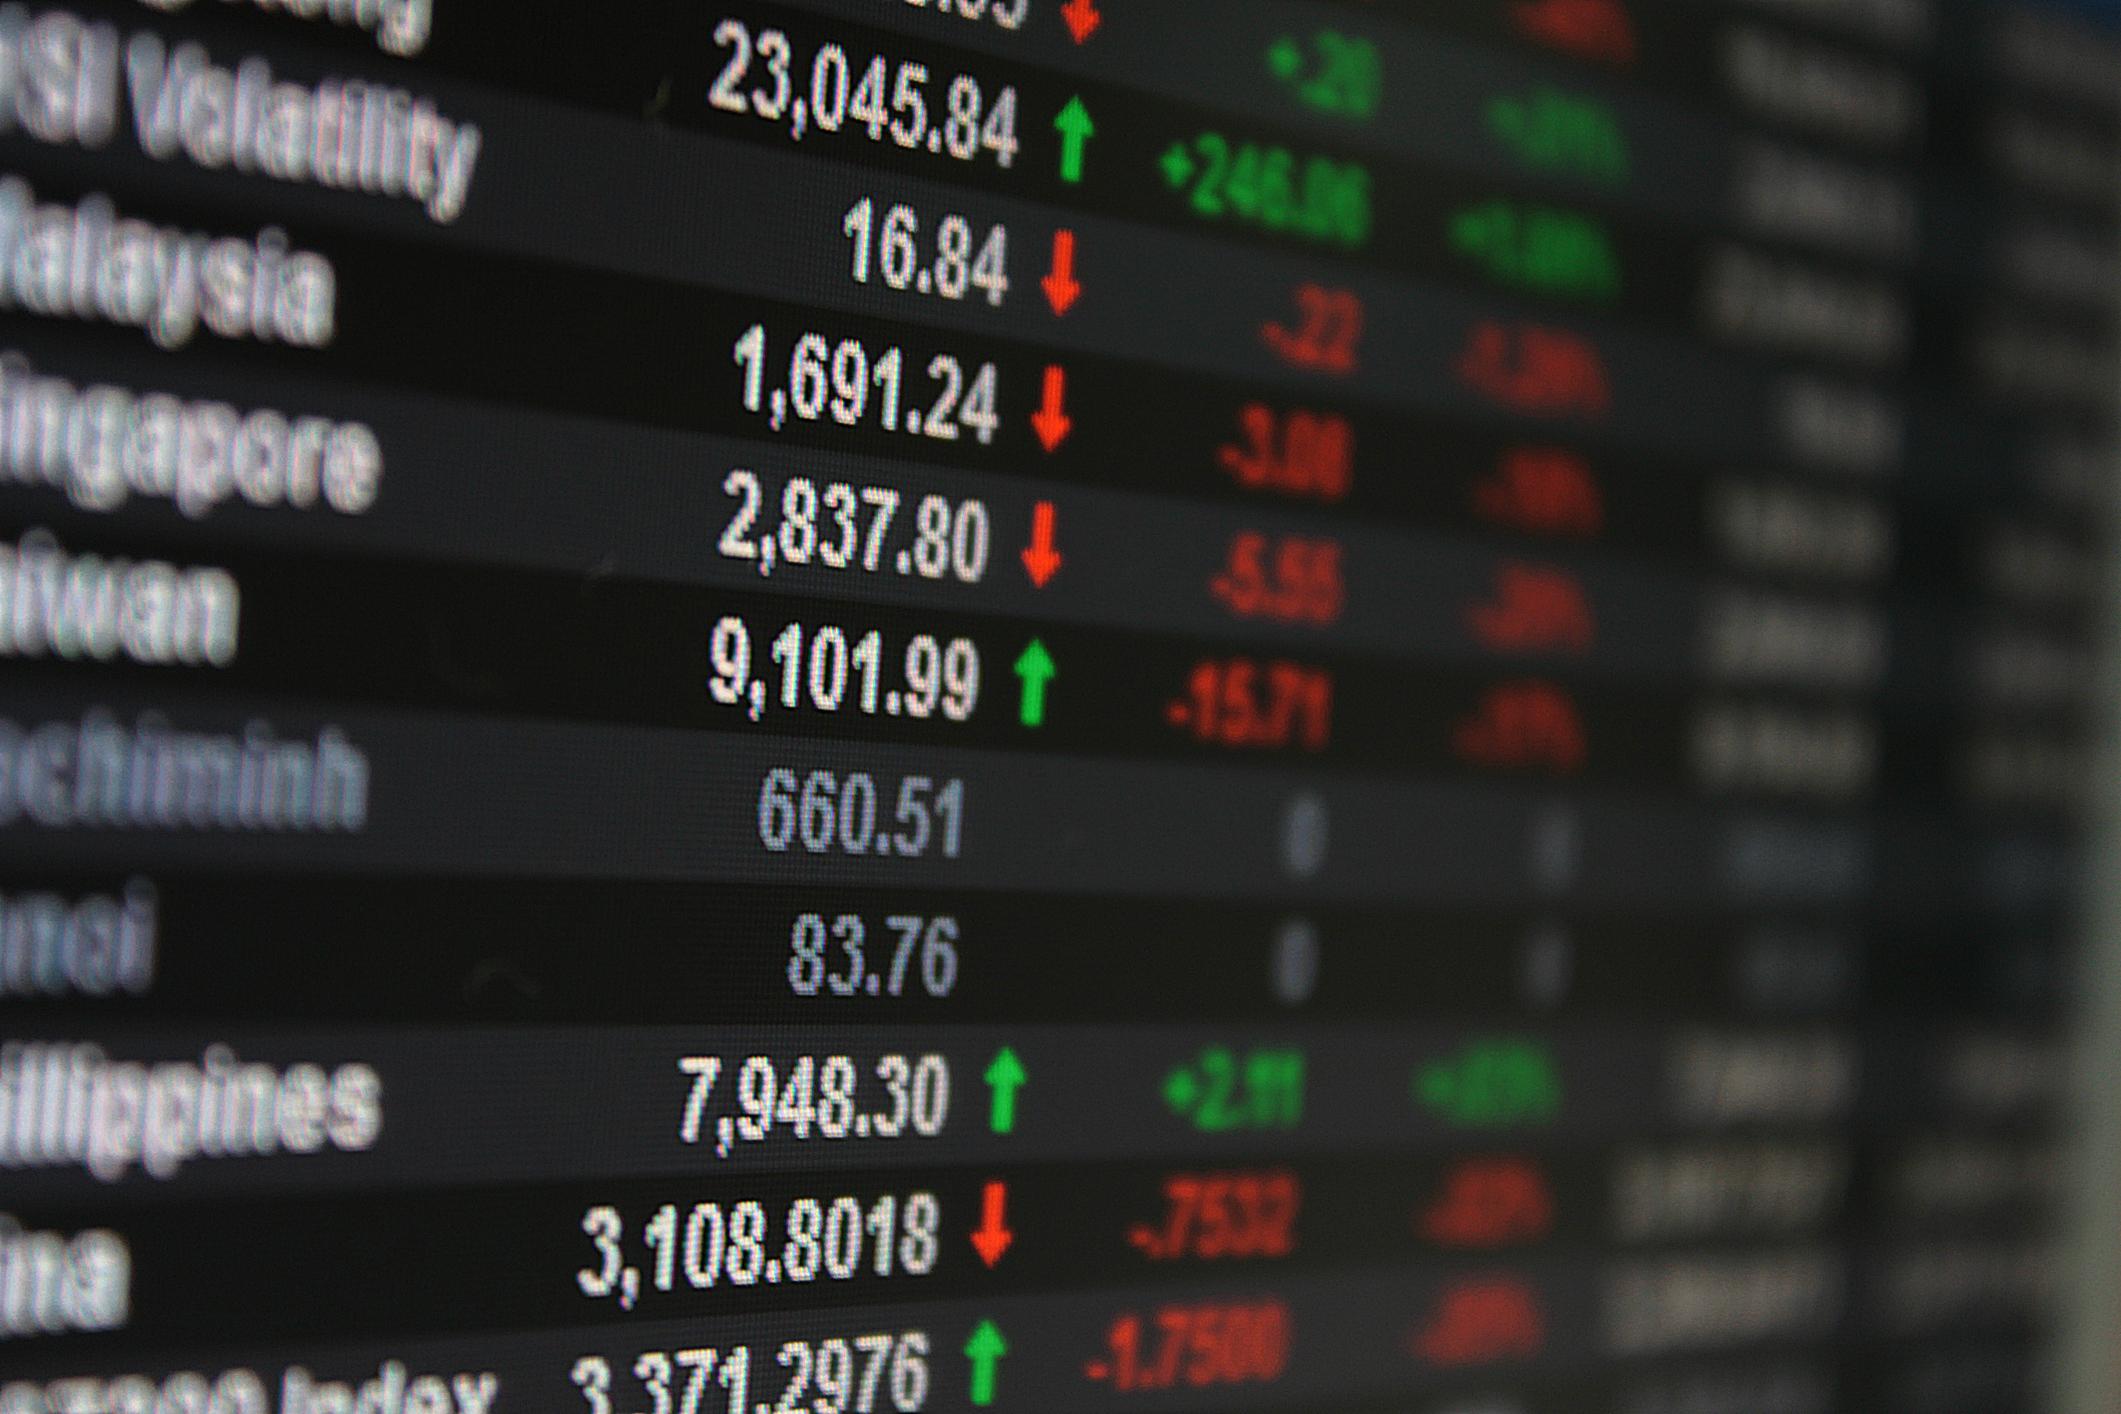 Digital display showing various Asian stock market index prices.